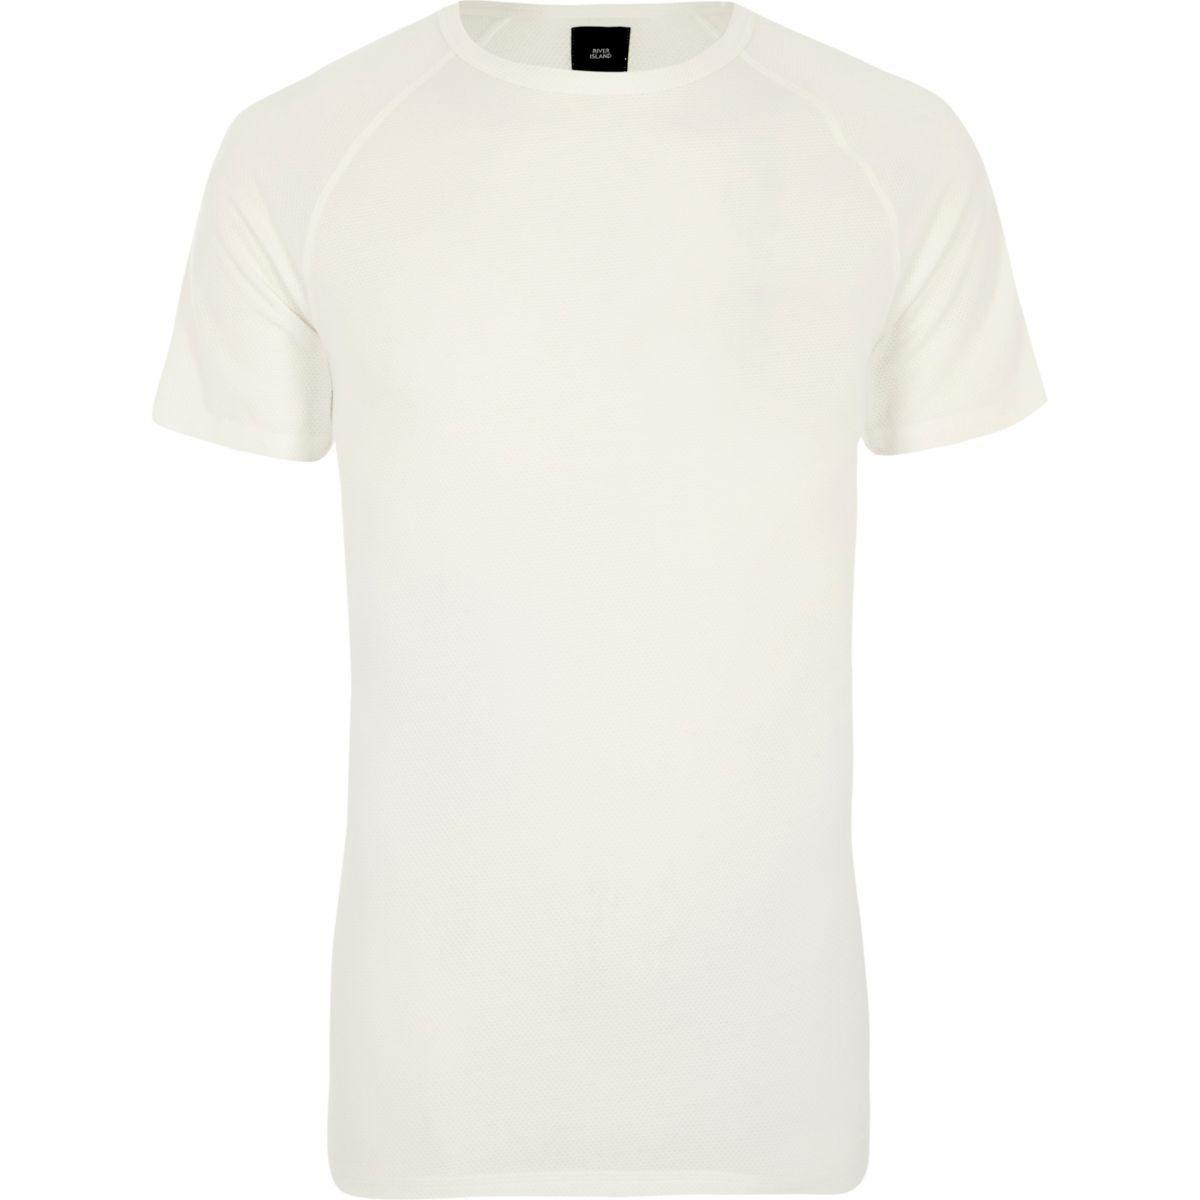 Cream pique slim fit raglan T-shirt